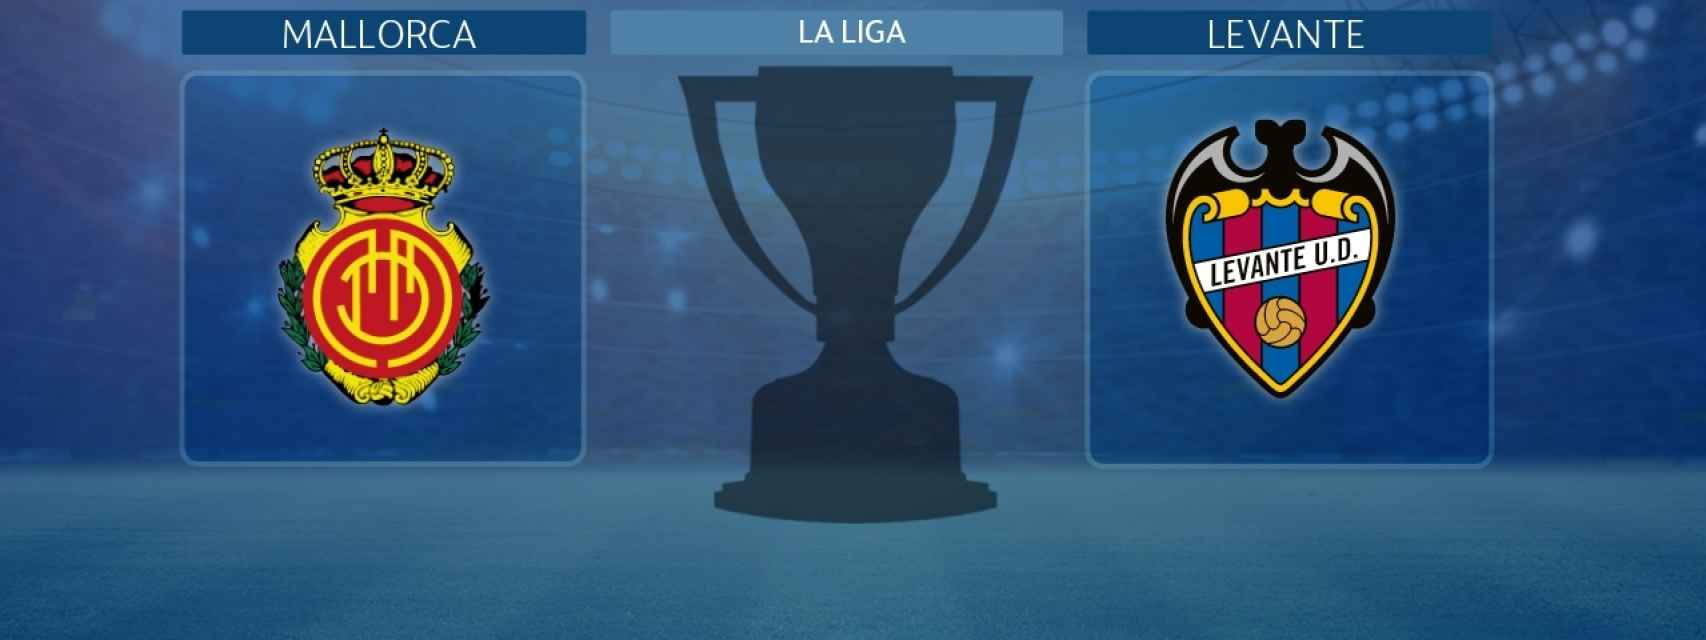 Mallorca - Levante, partido de La Liga